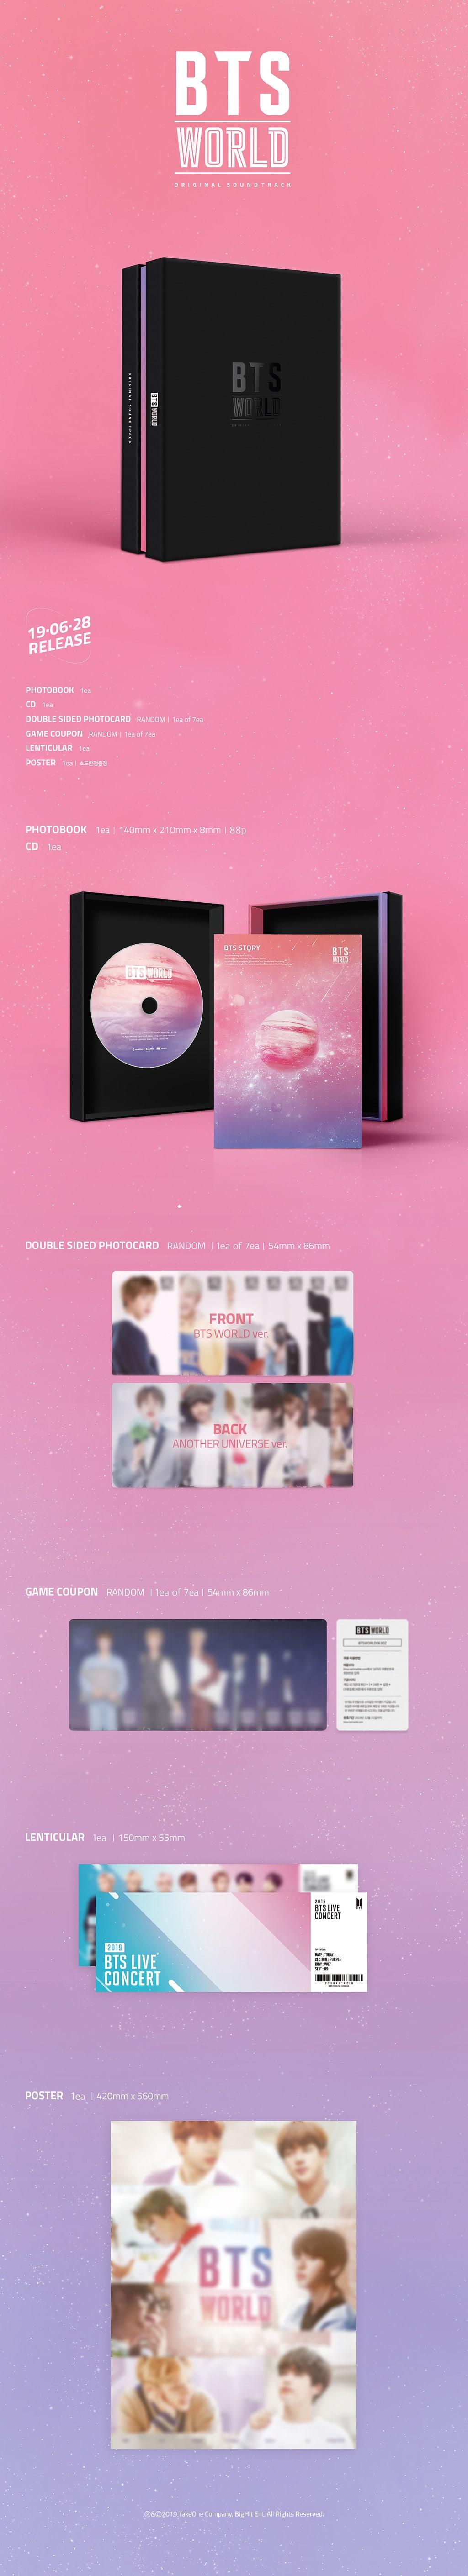 BTS to release BTS WORLD soundtrack album | SBS PopAsia